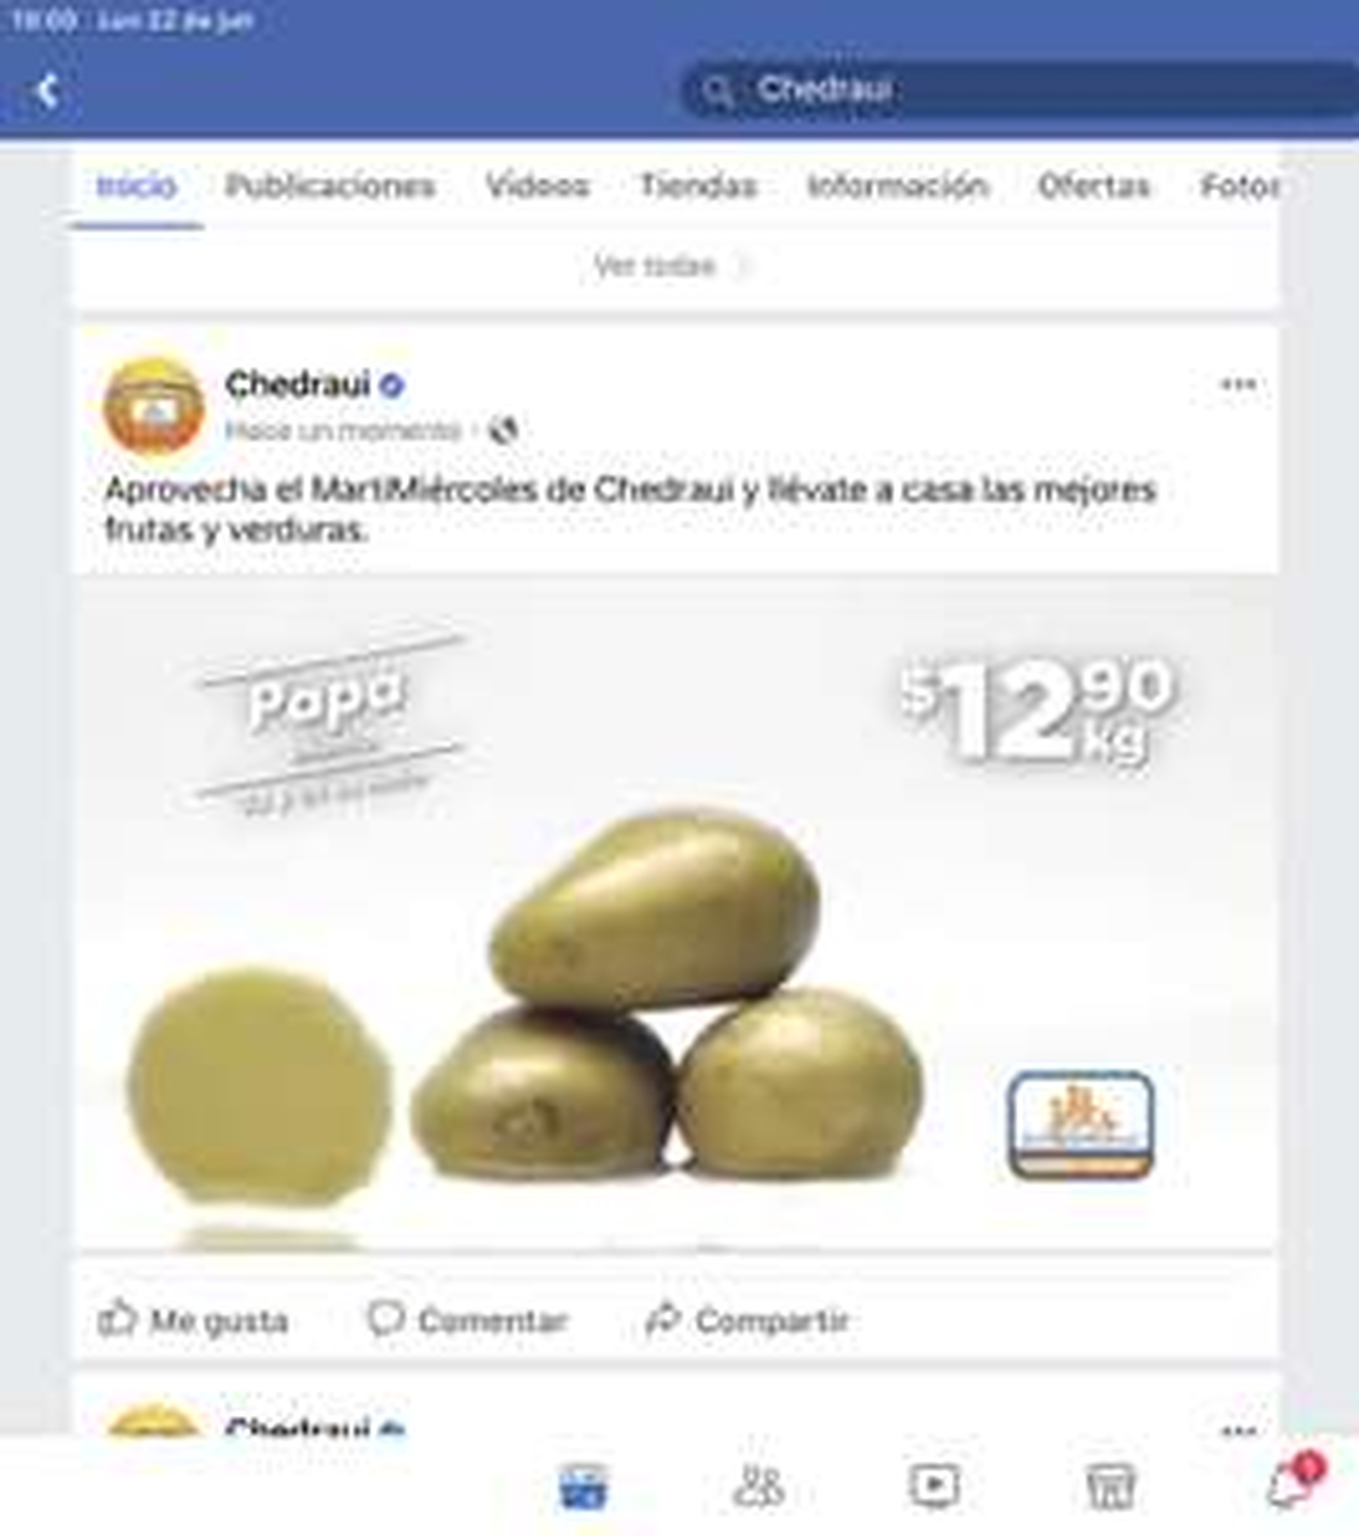 Chedraui: Martimiercoles